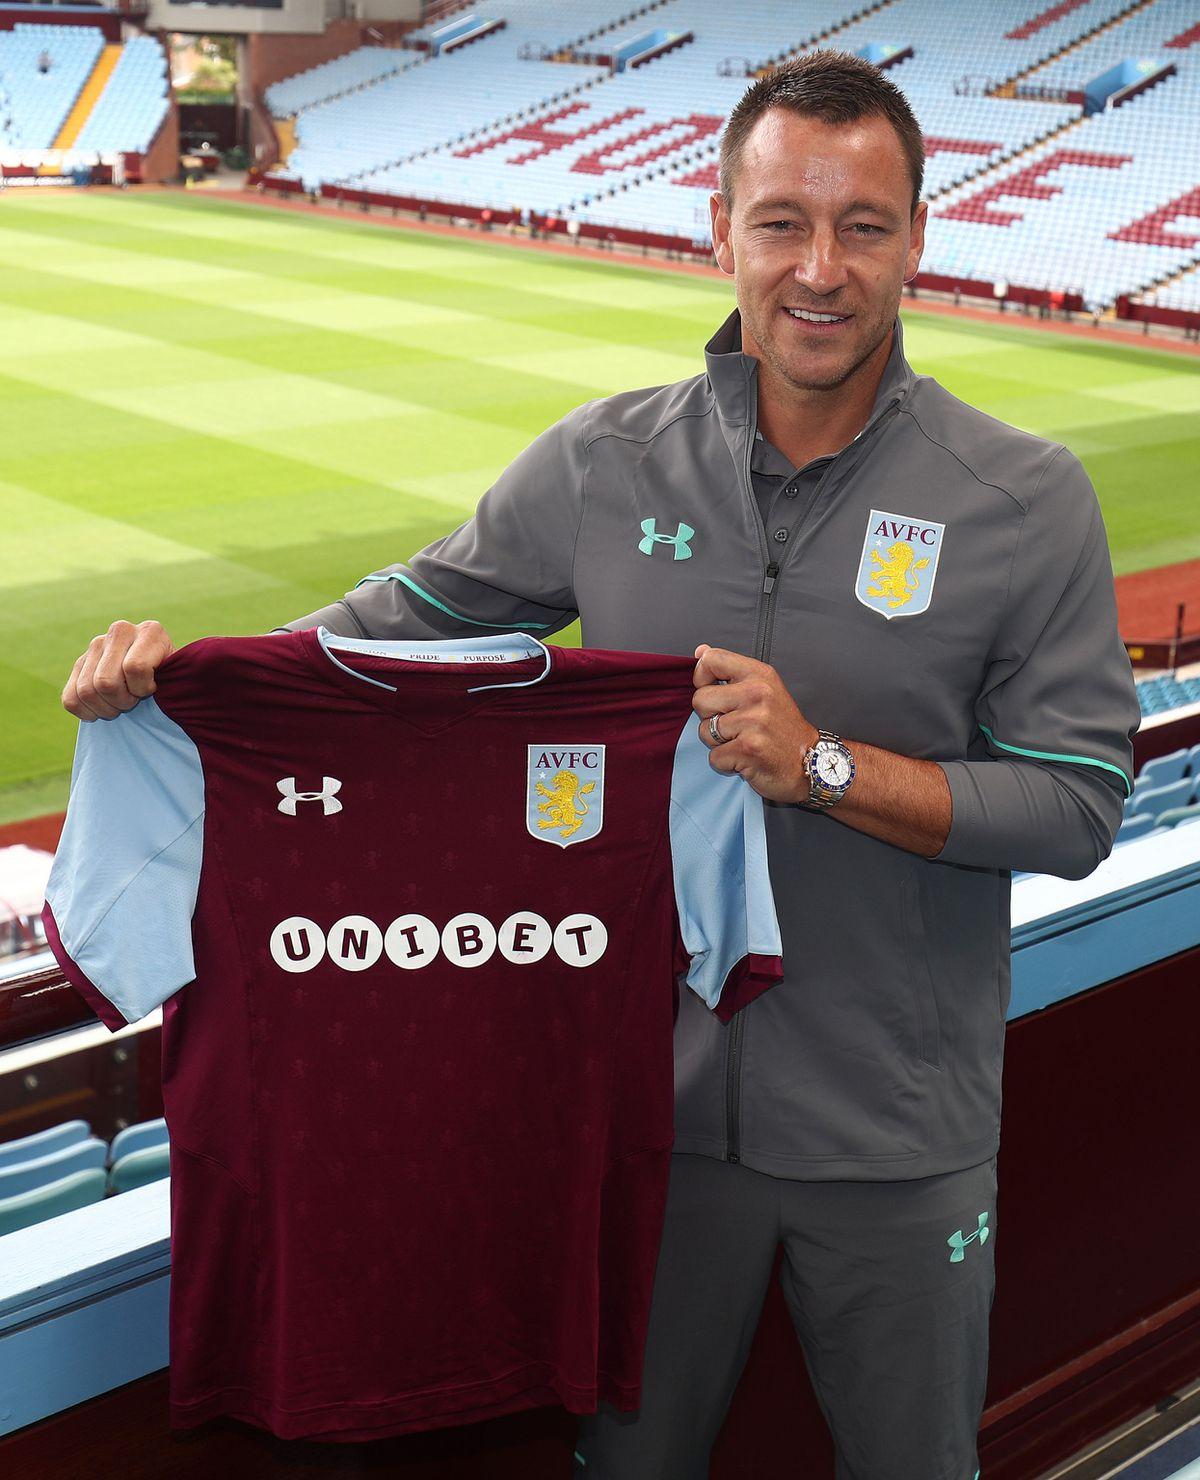 Aston Villa's shock deal for John Terry has made waves throughout English football.